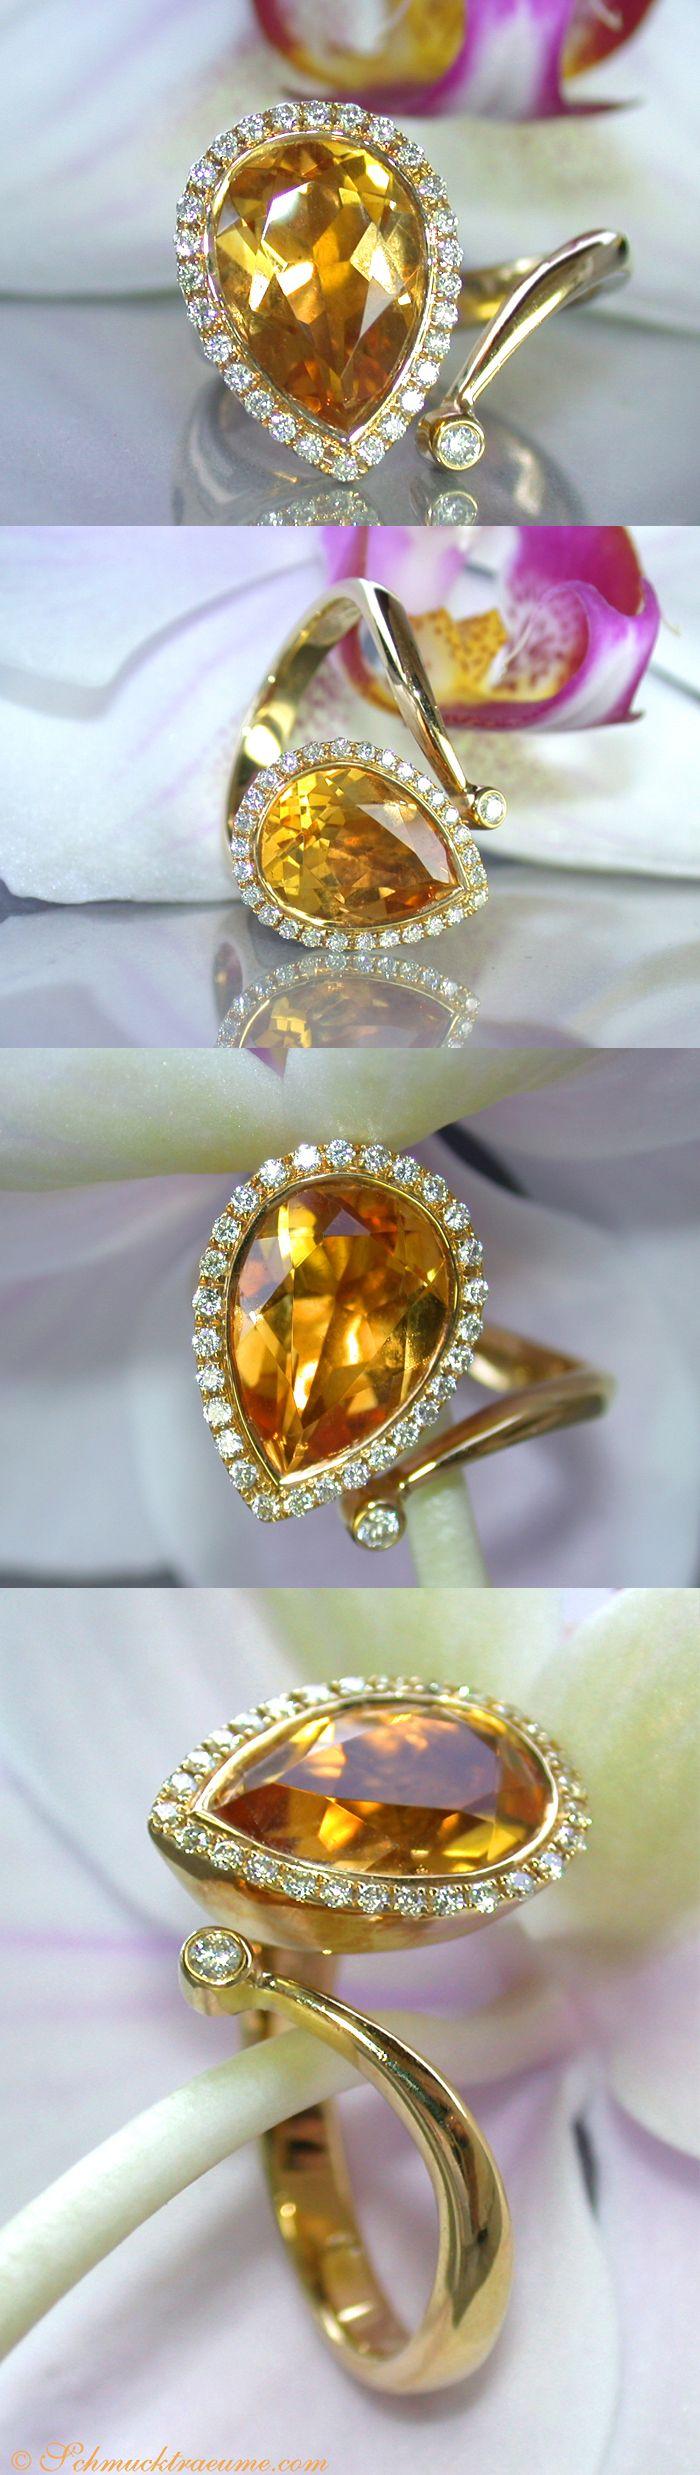 Beautiful Citrin Diamond Ring, 3,15 ct. YG18K - Visit: schmucktraeume.com - Like: https://www.facebook.com/pages/Noble-Juwelen/150871984924926?ref=hl - Mail: info@schmucktraeume.com